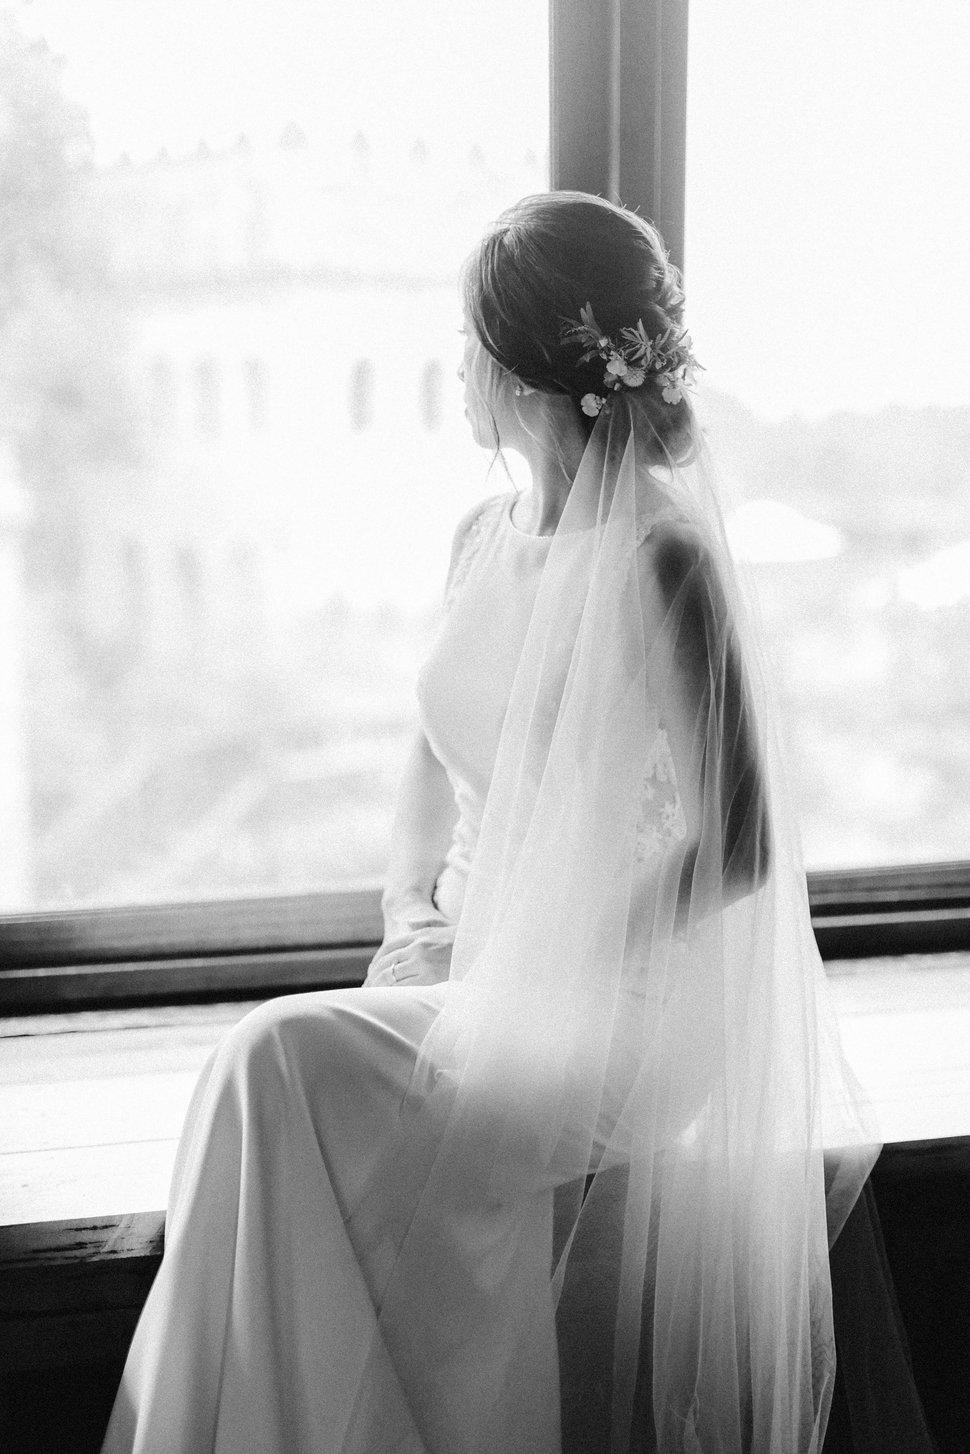 AG3_7087A-2 - Cradle Wedding搖籃手工婚紗《結婚吧》